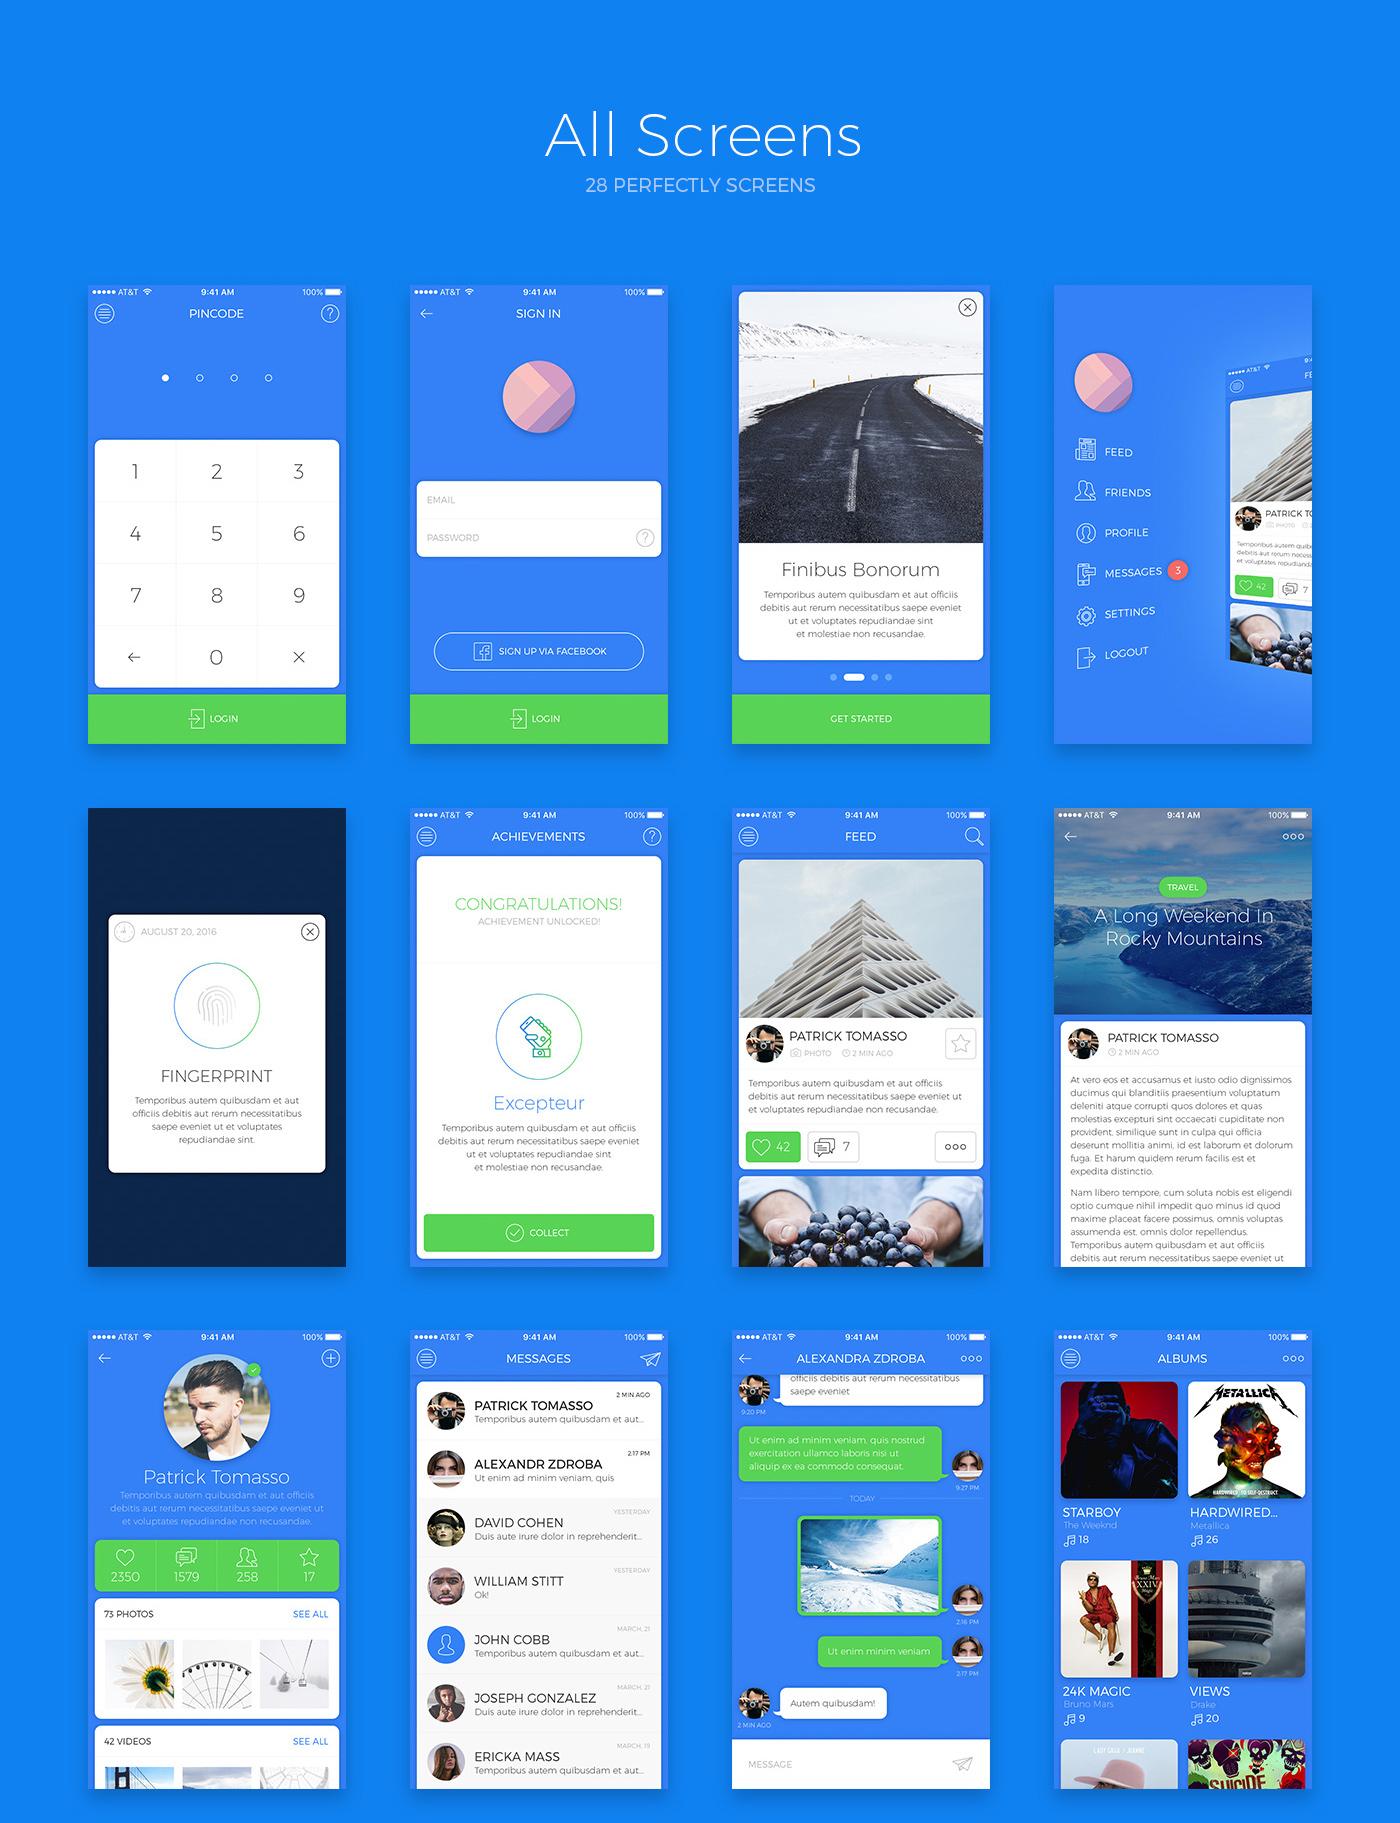 7 Social screens, 7 base screens, 7 main screens for iOS Free App